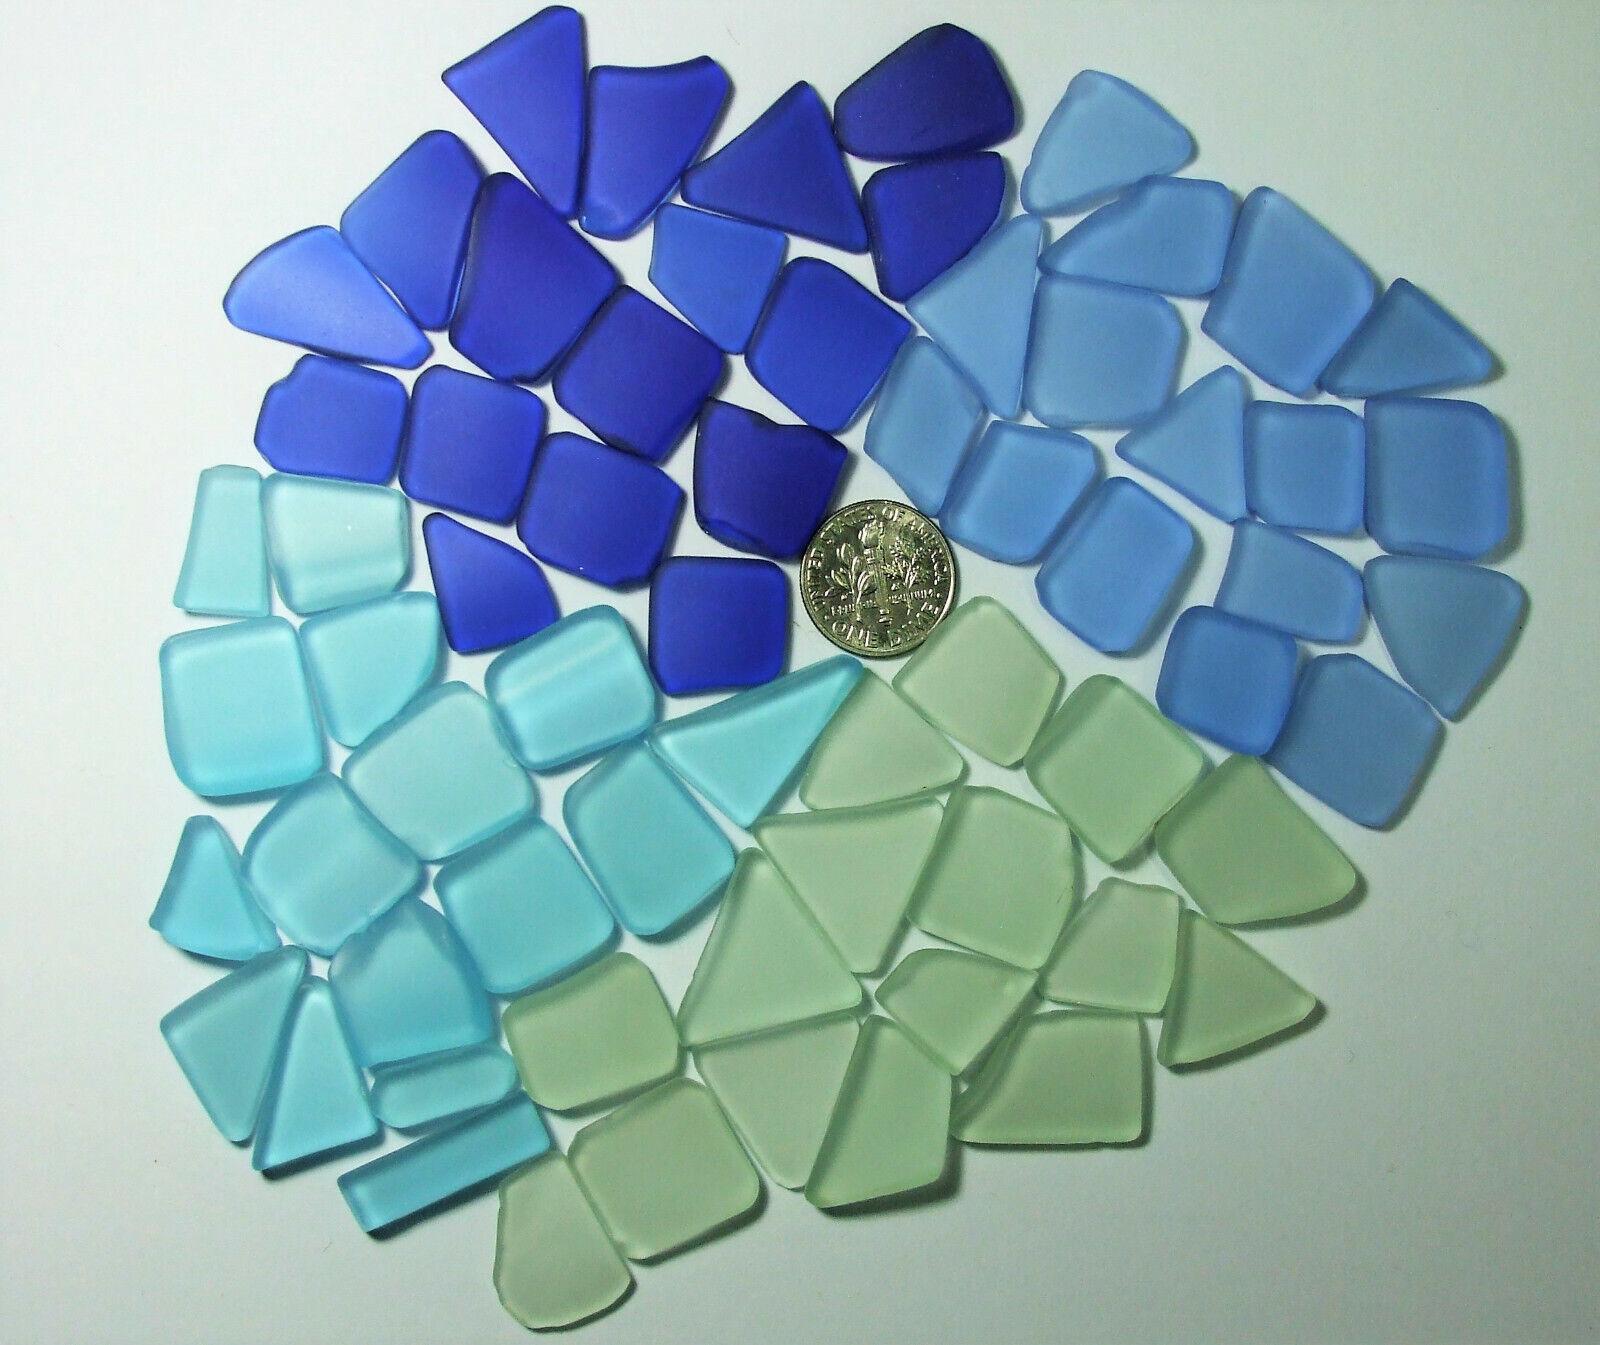 65 Small Blues Seafoam Cultured Beach Sea Glass Artist Mix Mosaics - $3.99